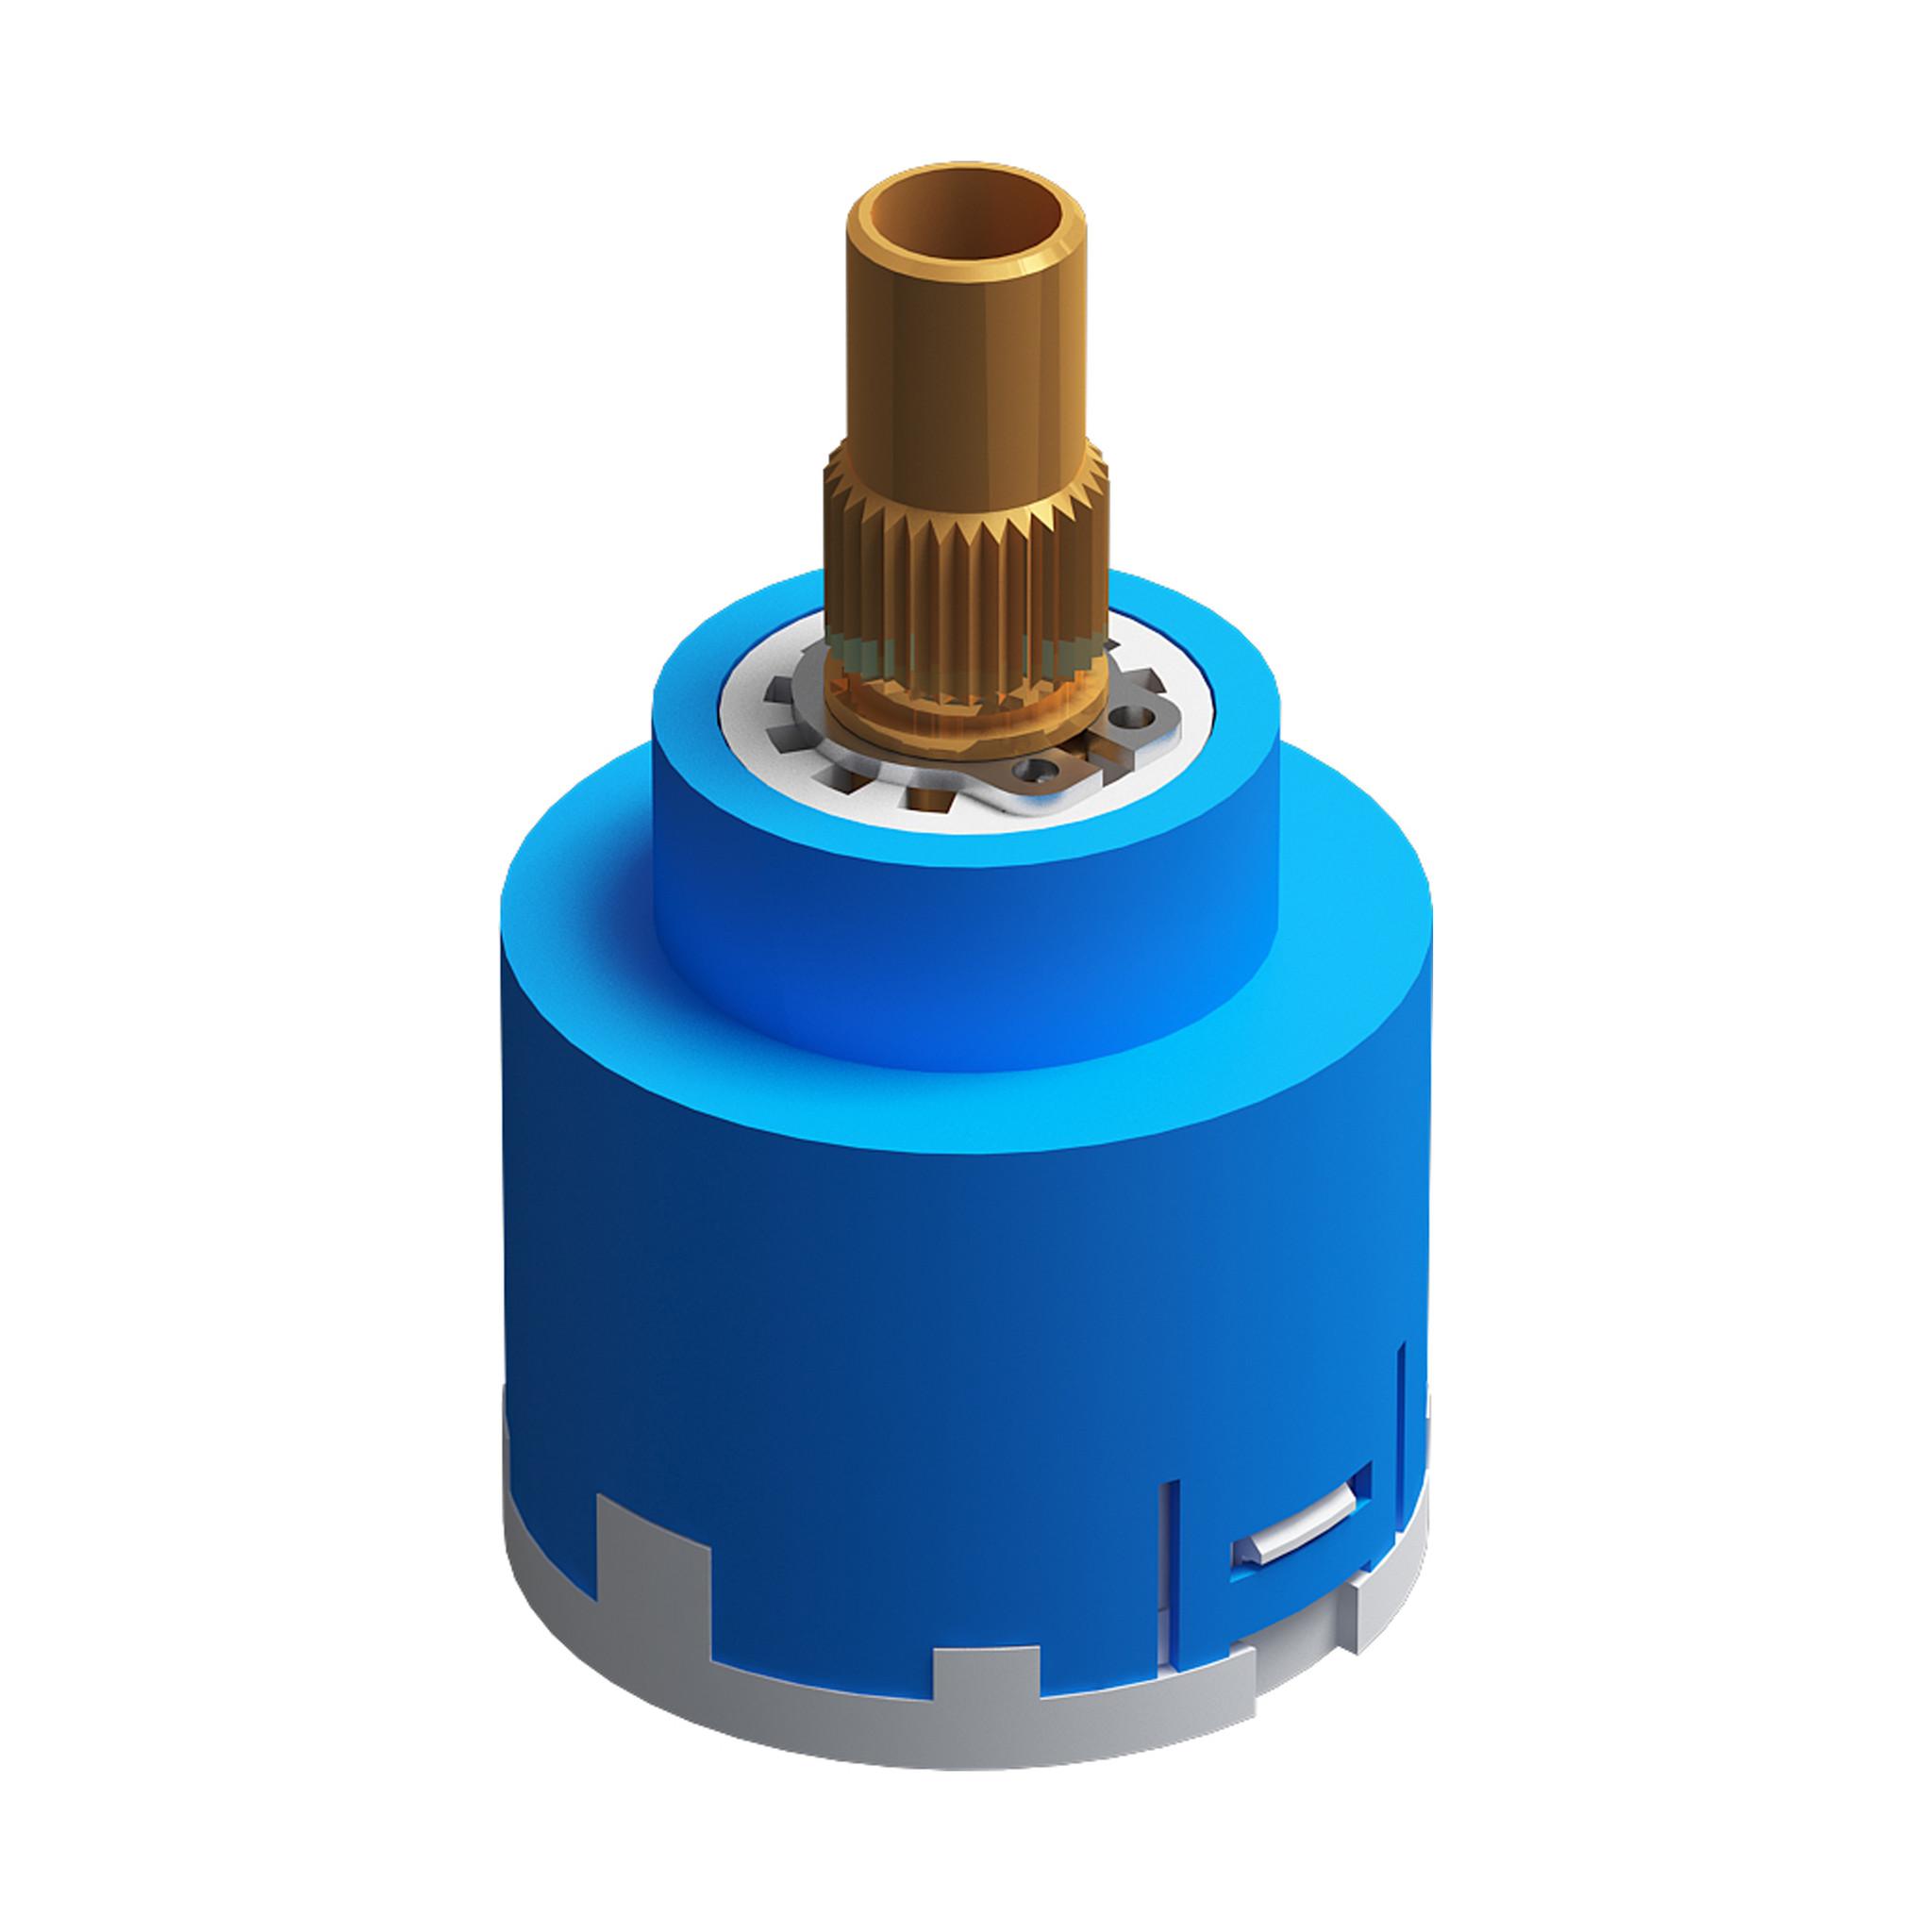 Xo bathtub mixer tap Xo type 8 ceramic cartridge